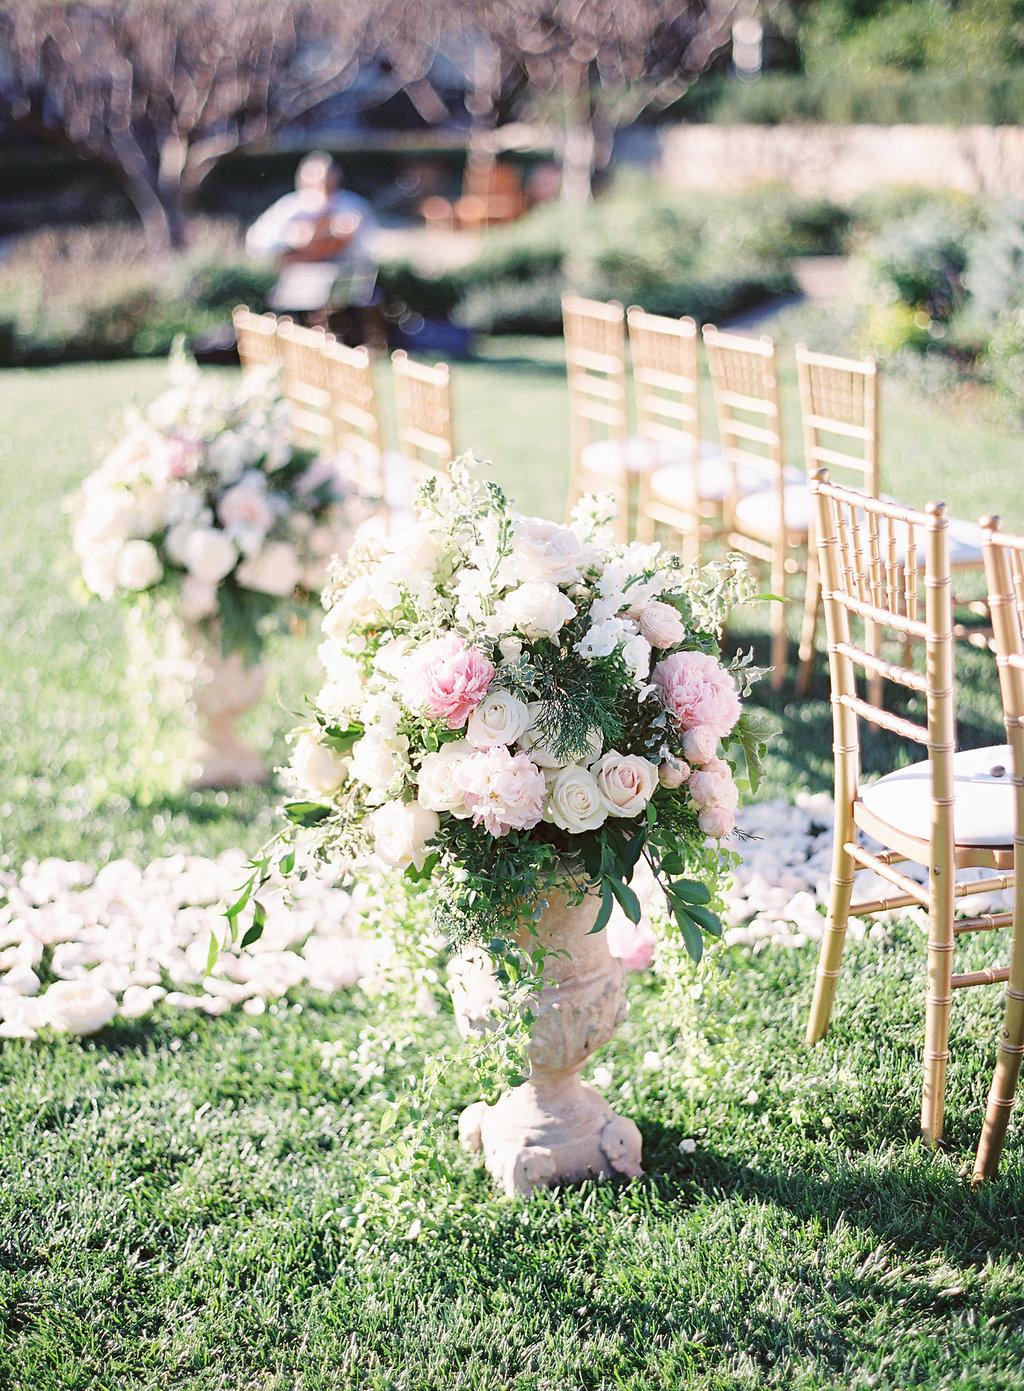 San Ysidro Ranch Wedding   Cody Floral Design   Santa Barbara Wedding Florist   Photography by The Great Romance